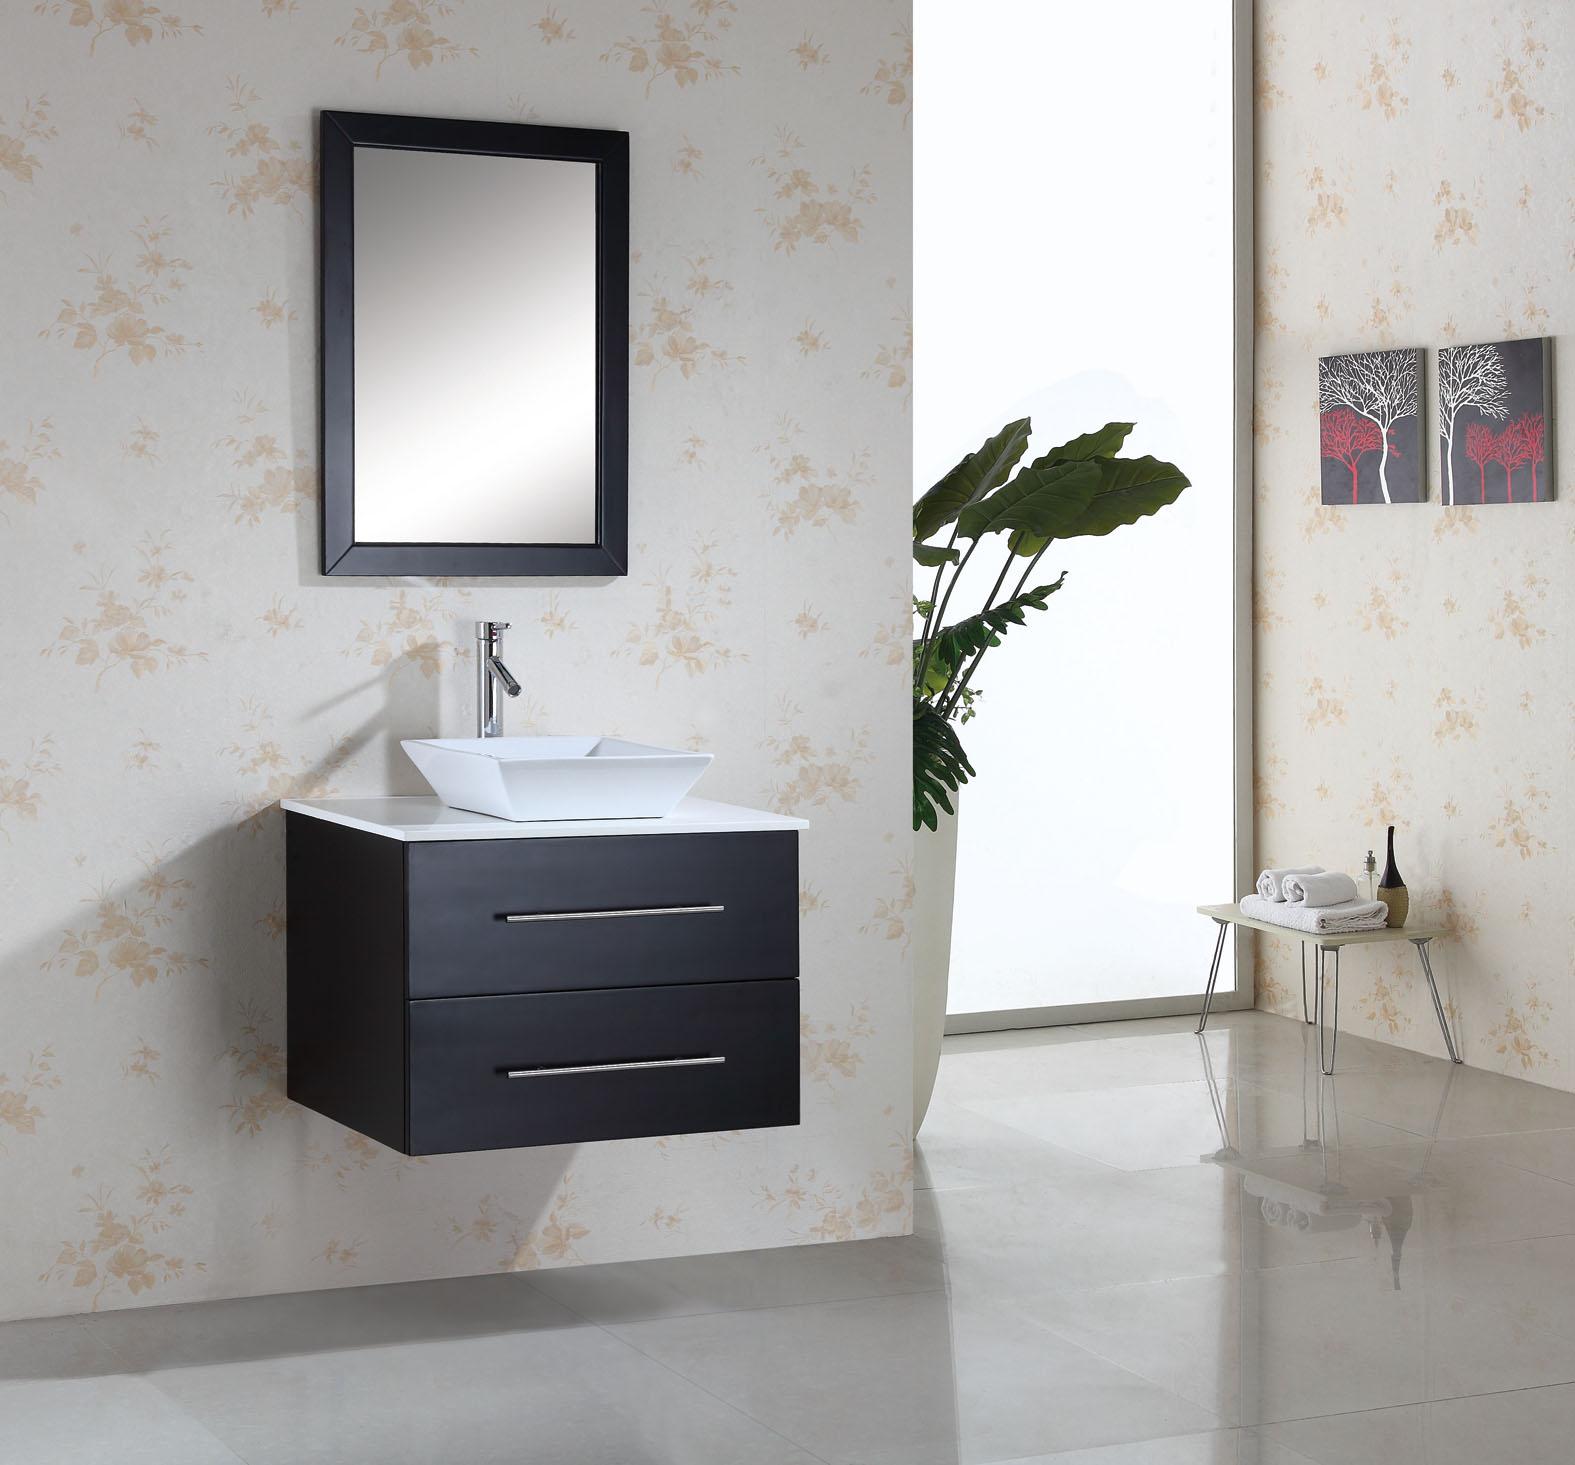 mount backsplash cabinet floating no cottee signature bathroom hardware sink wall vessel shop lp white x vanity